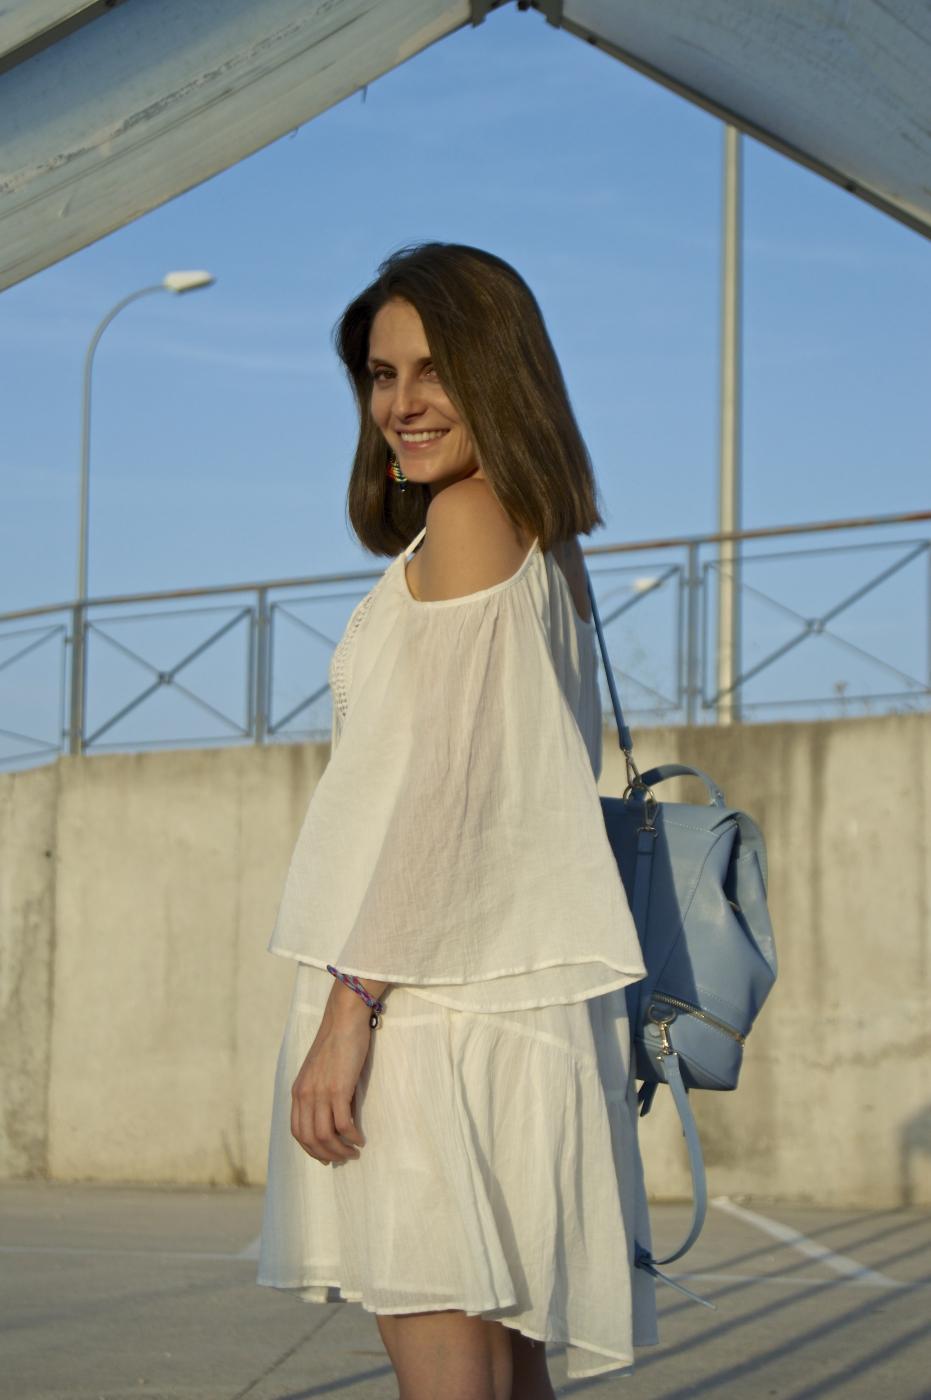 lara-vazquez-madlula-style-fashion-blog-moda-en-la-calle